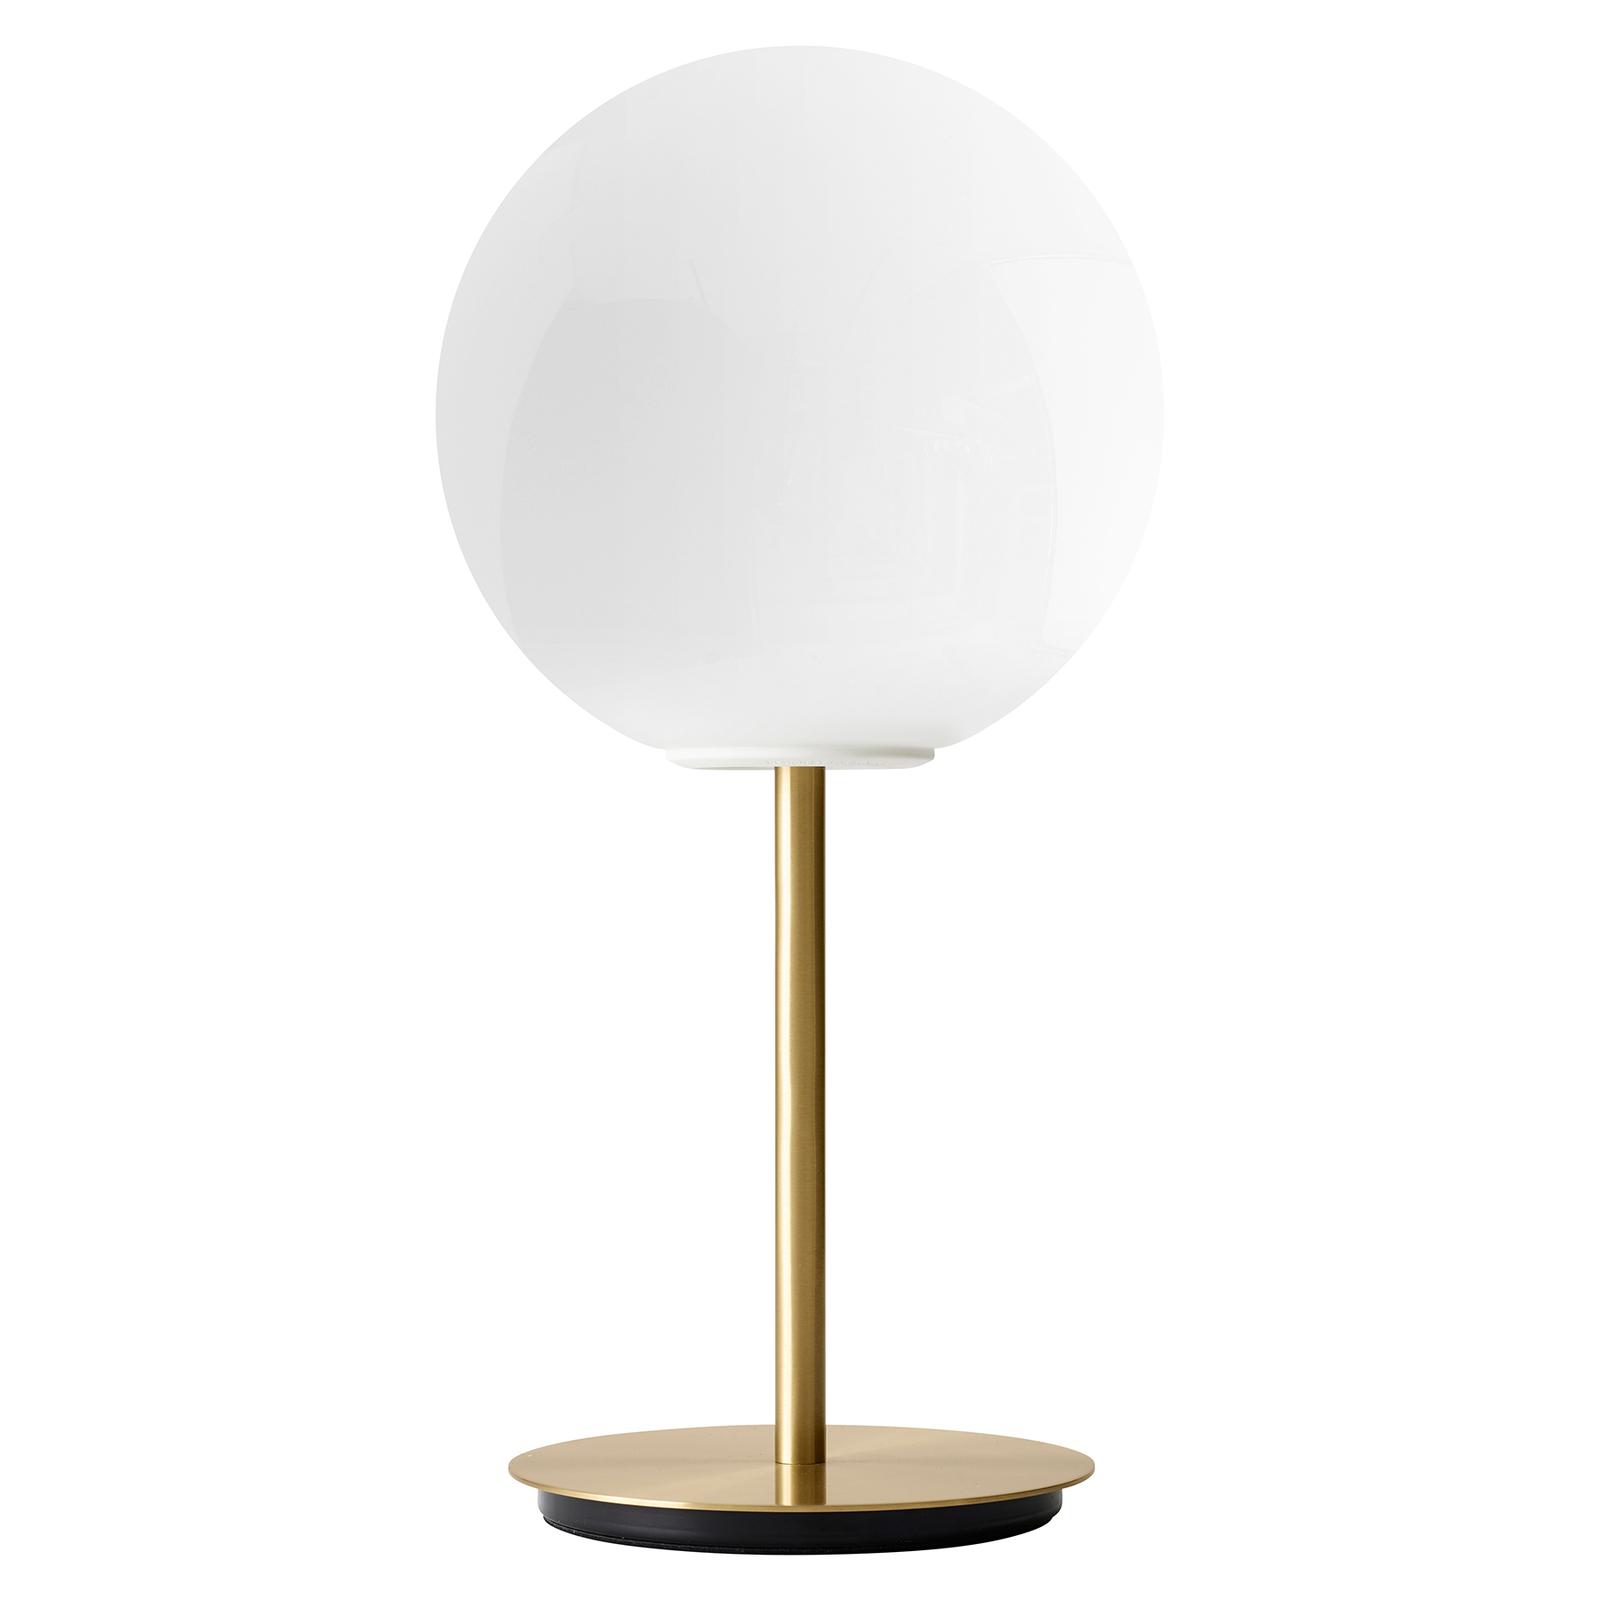 Menu TR Bulb pöytälamppu 41 cm messinki/kiilto